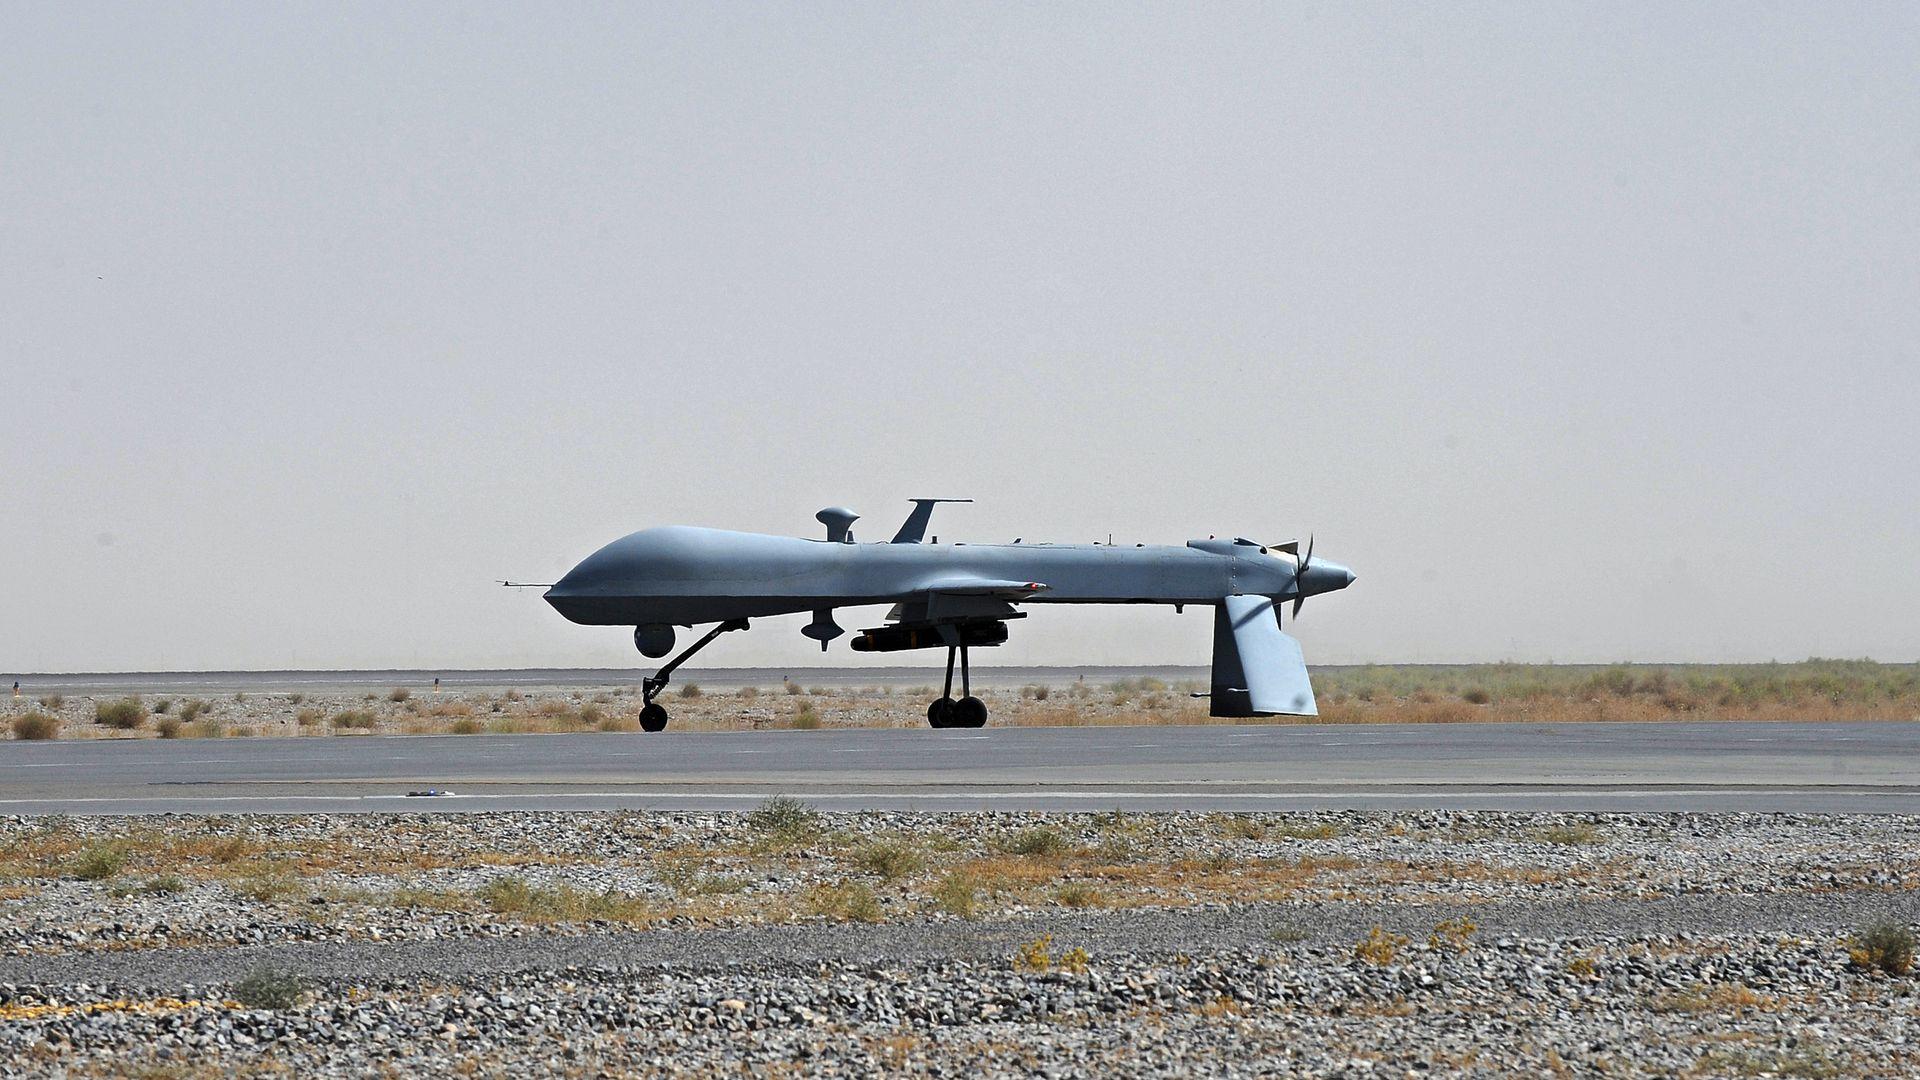 American Predator drone on tarmac